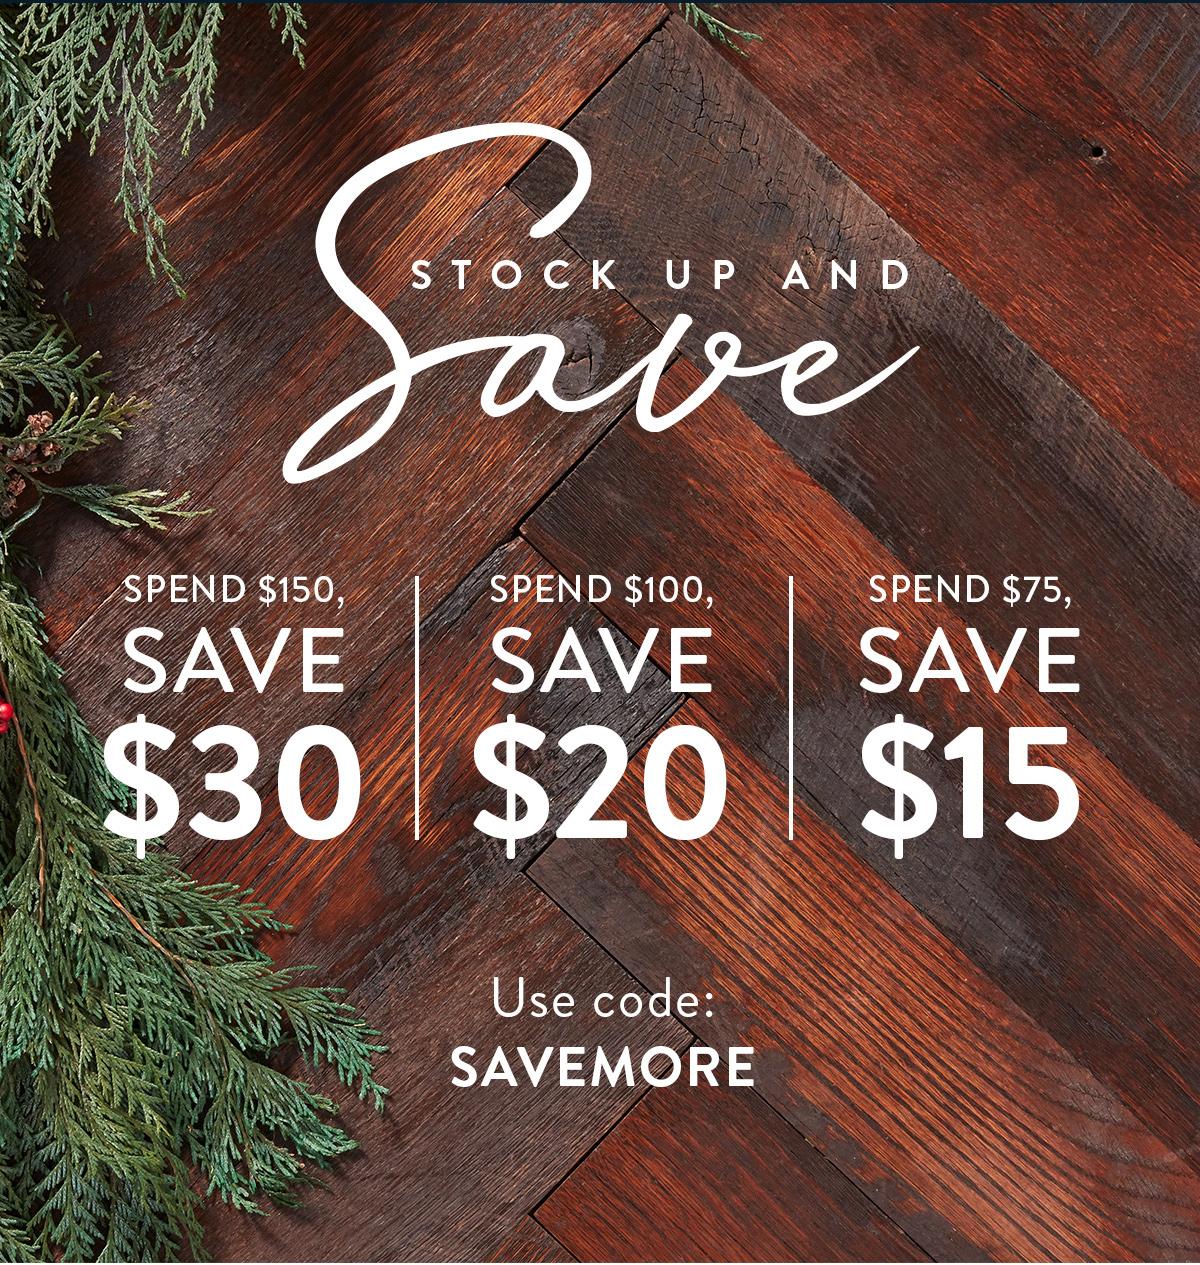 Stock Up & Save. Spend $150, Save $30. Spend $100, Save $20. Spend $75, Save $15.